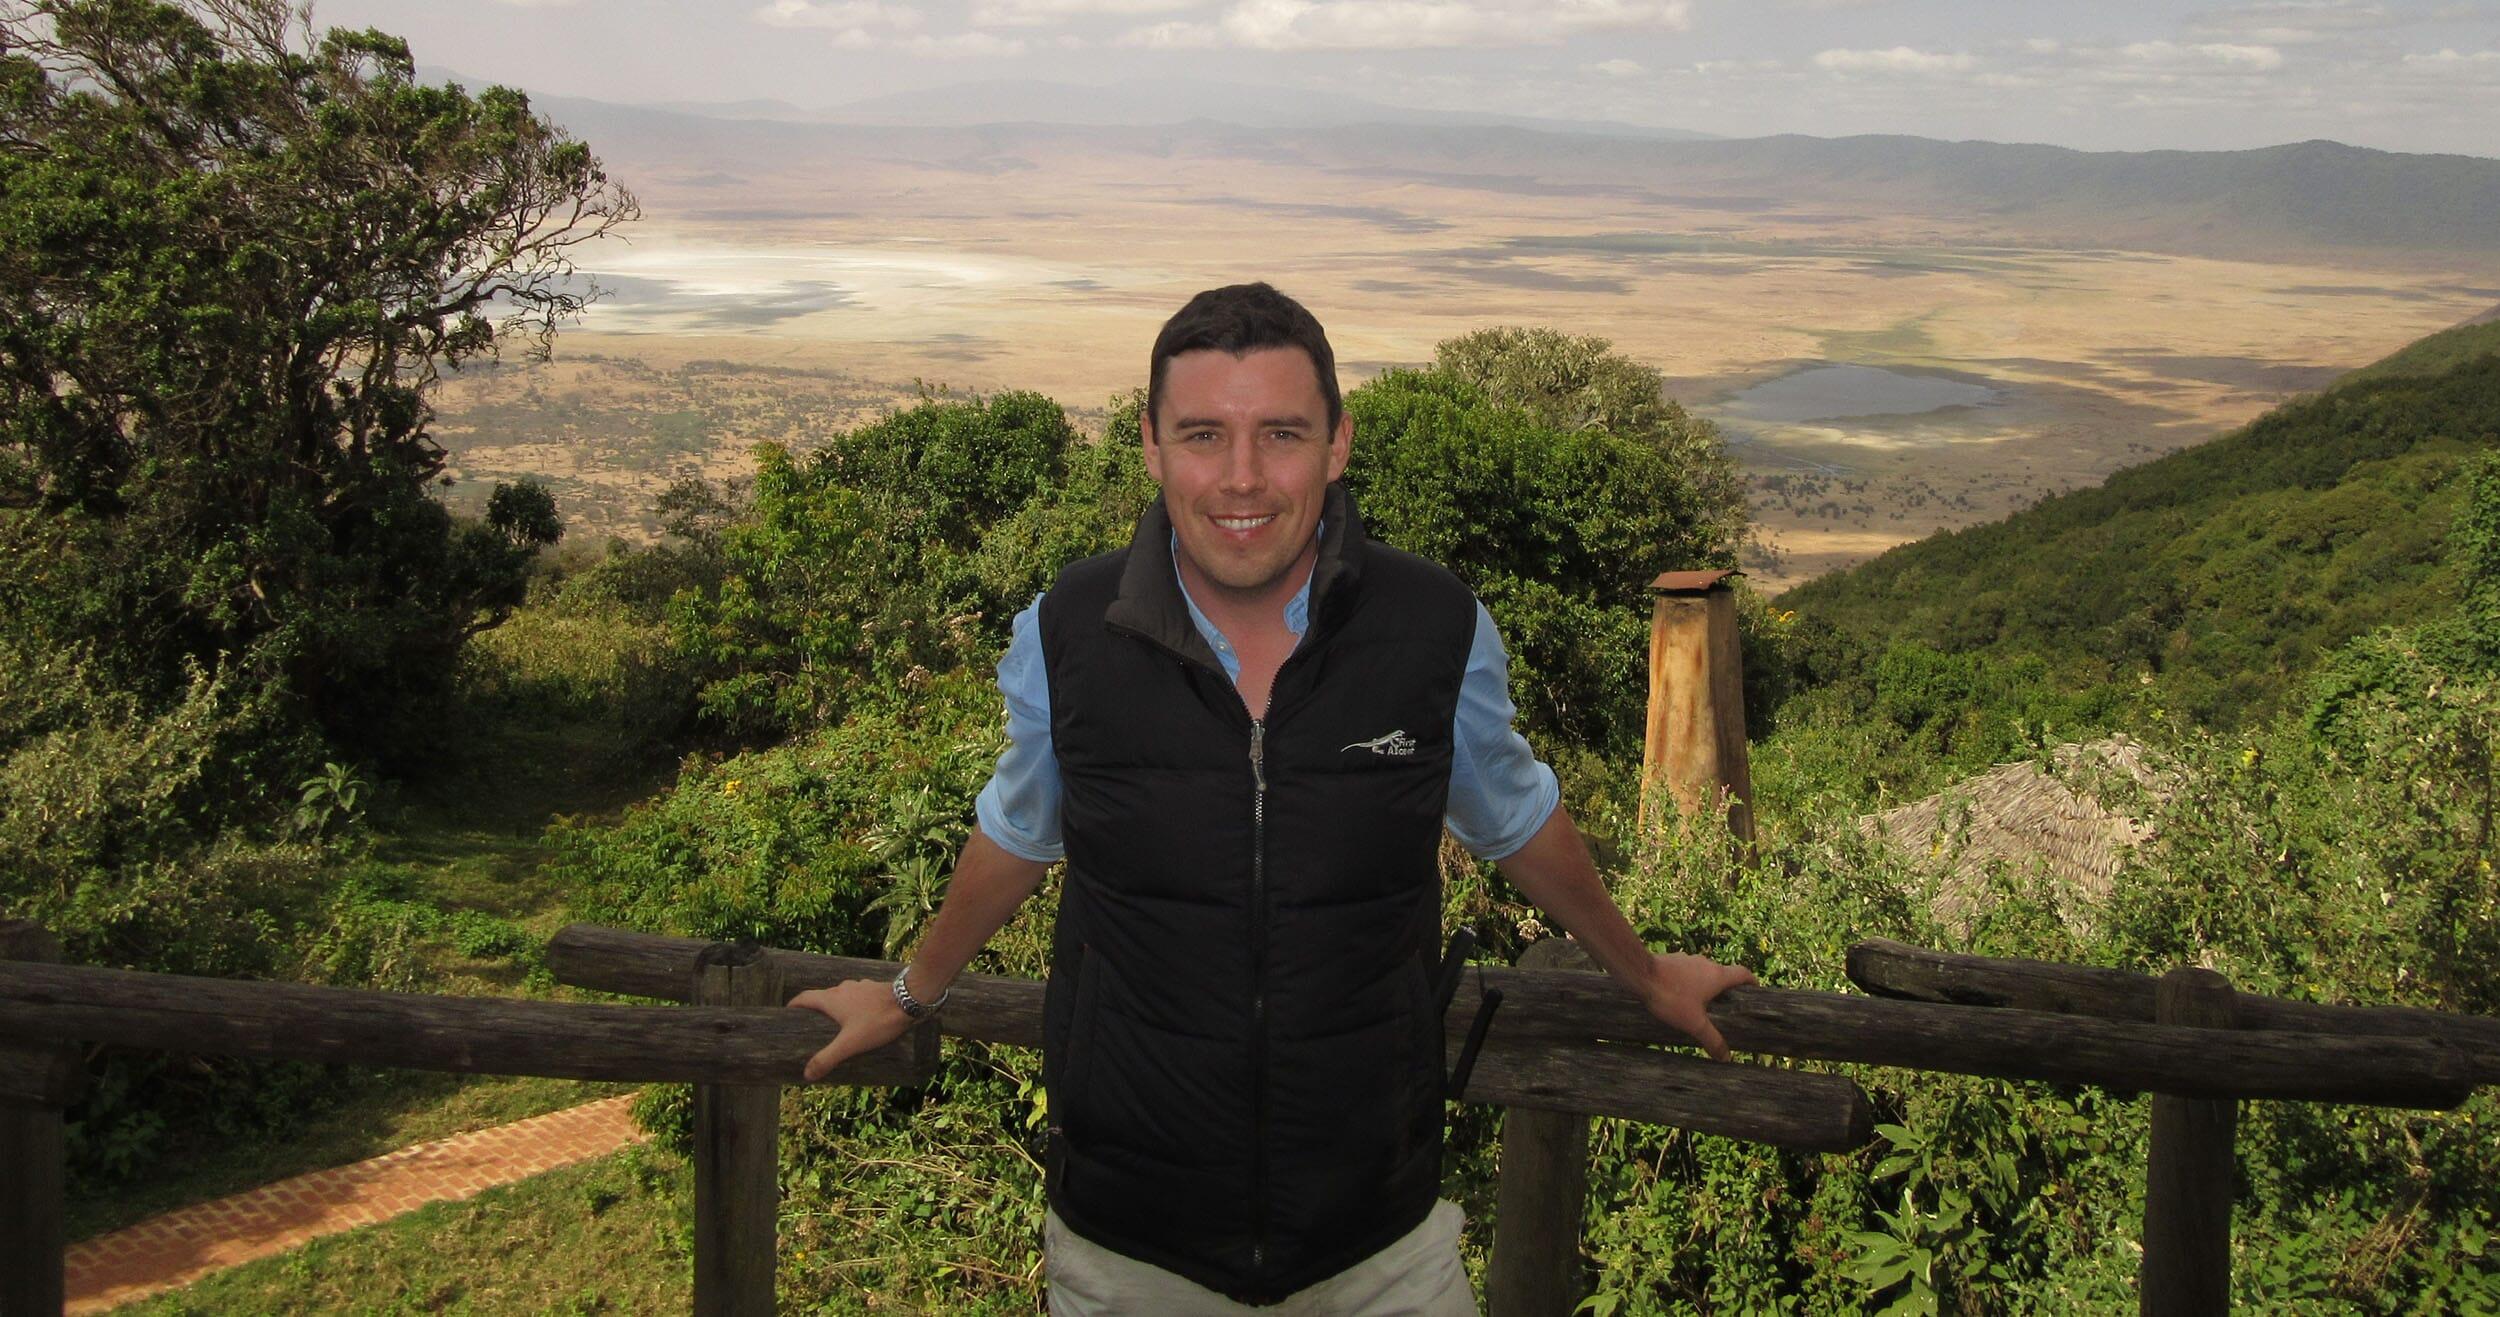 Mike-at-Ngorongoro-Crater-cropped